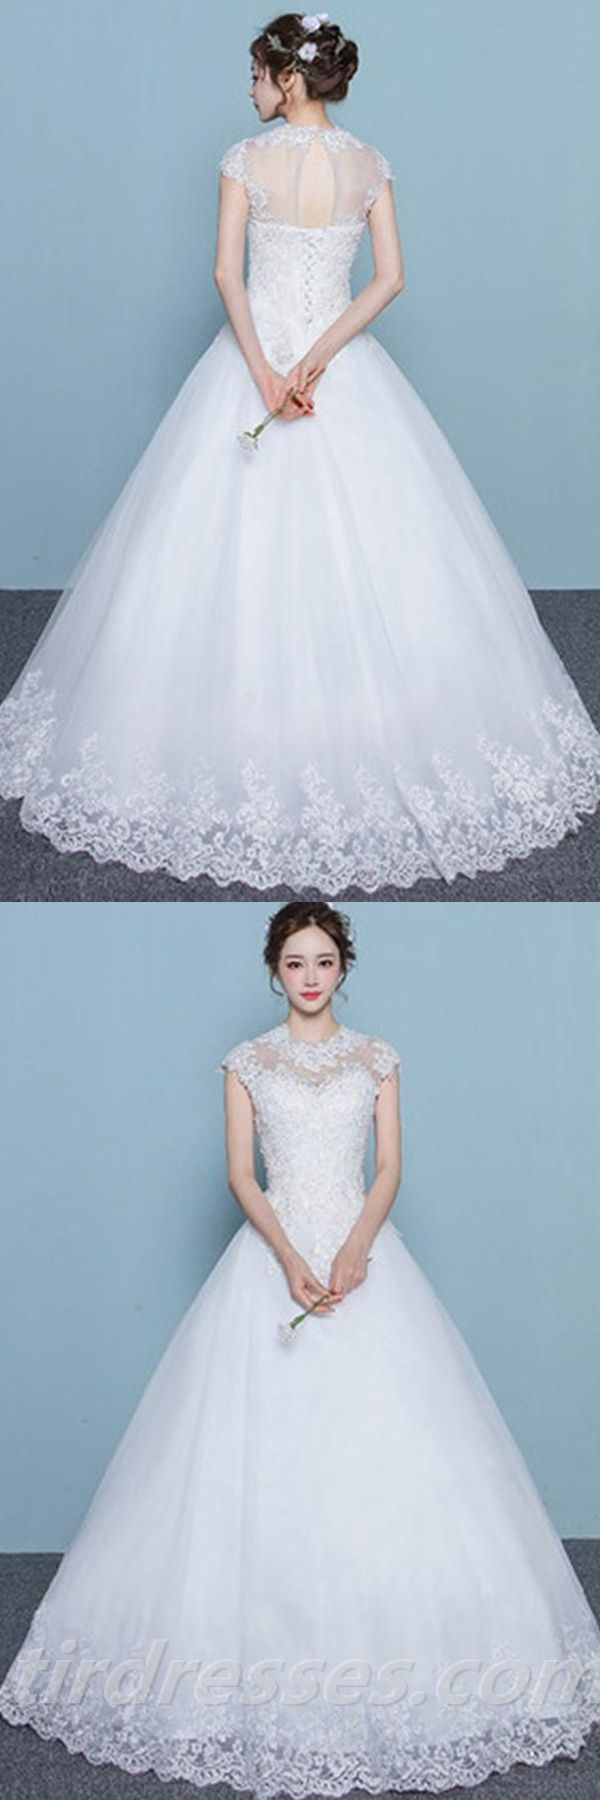 Mejores 18 imágenes de Vestits núvia en Pinterest | Vestidos de ...